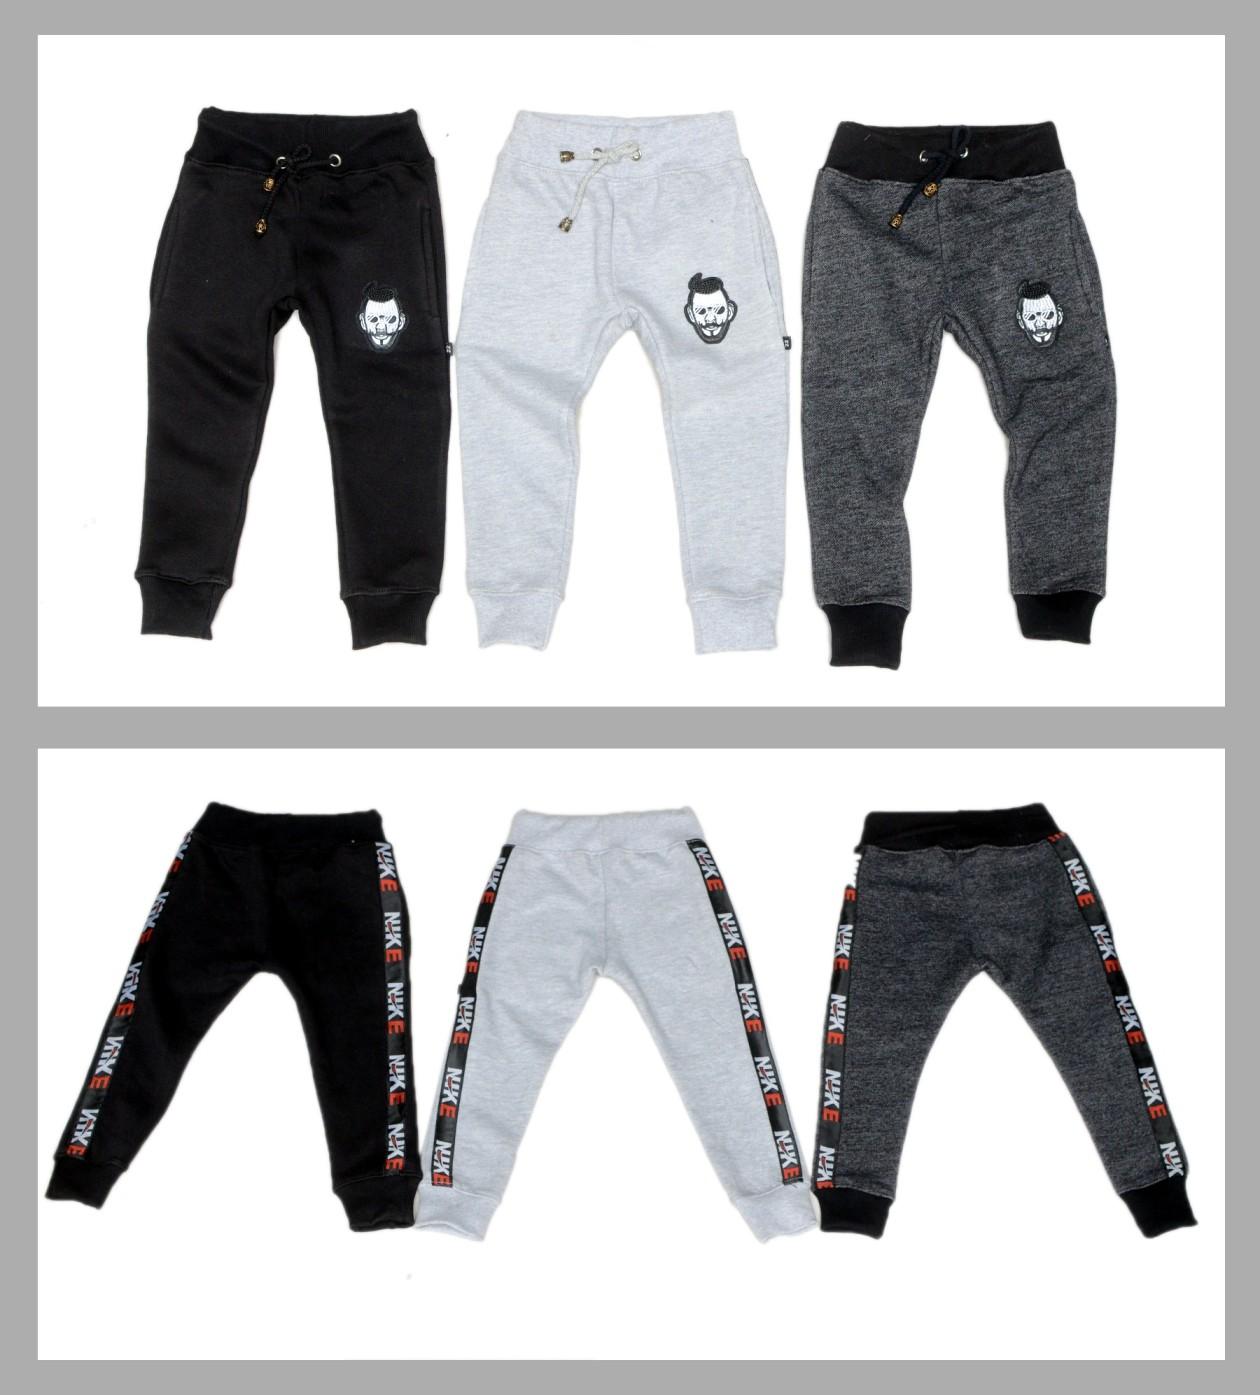 FatihaFashion Pack of 3 Random Colors Unisex Kids Cotton Pants Fleece Elastic Waist Winter Trousers Baby Bottoms Sweatpants 1-12 Years